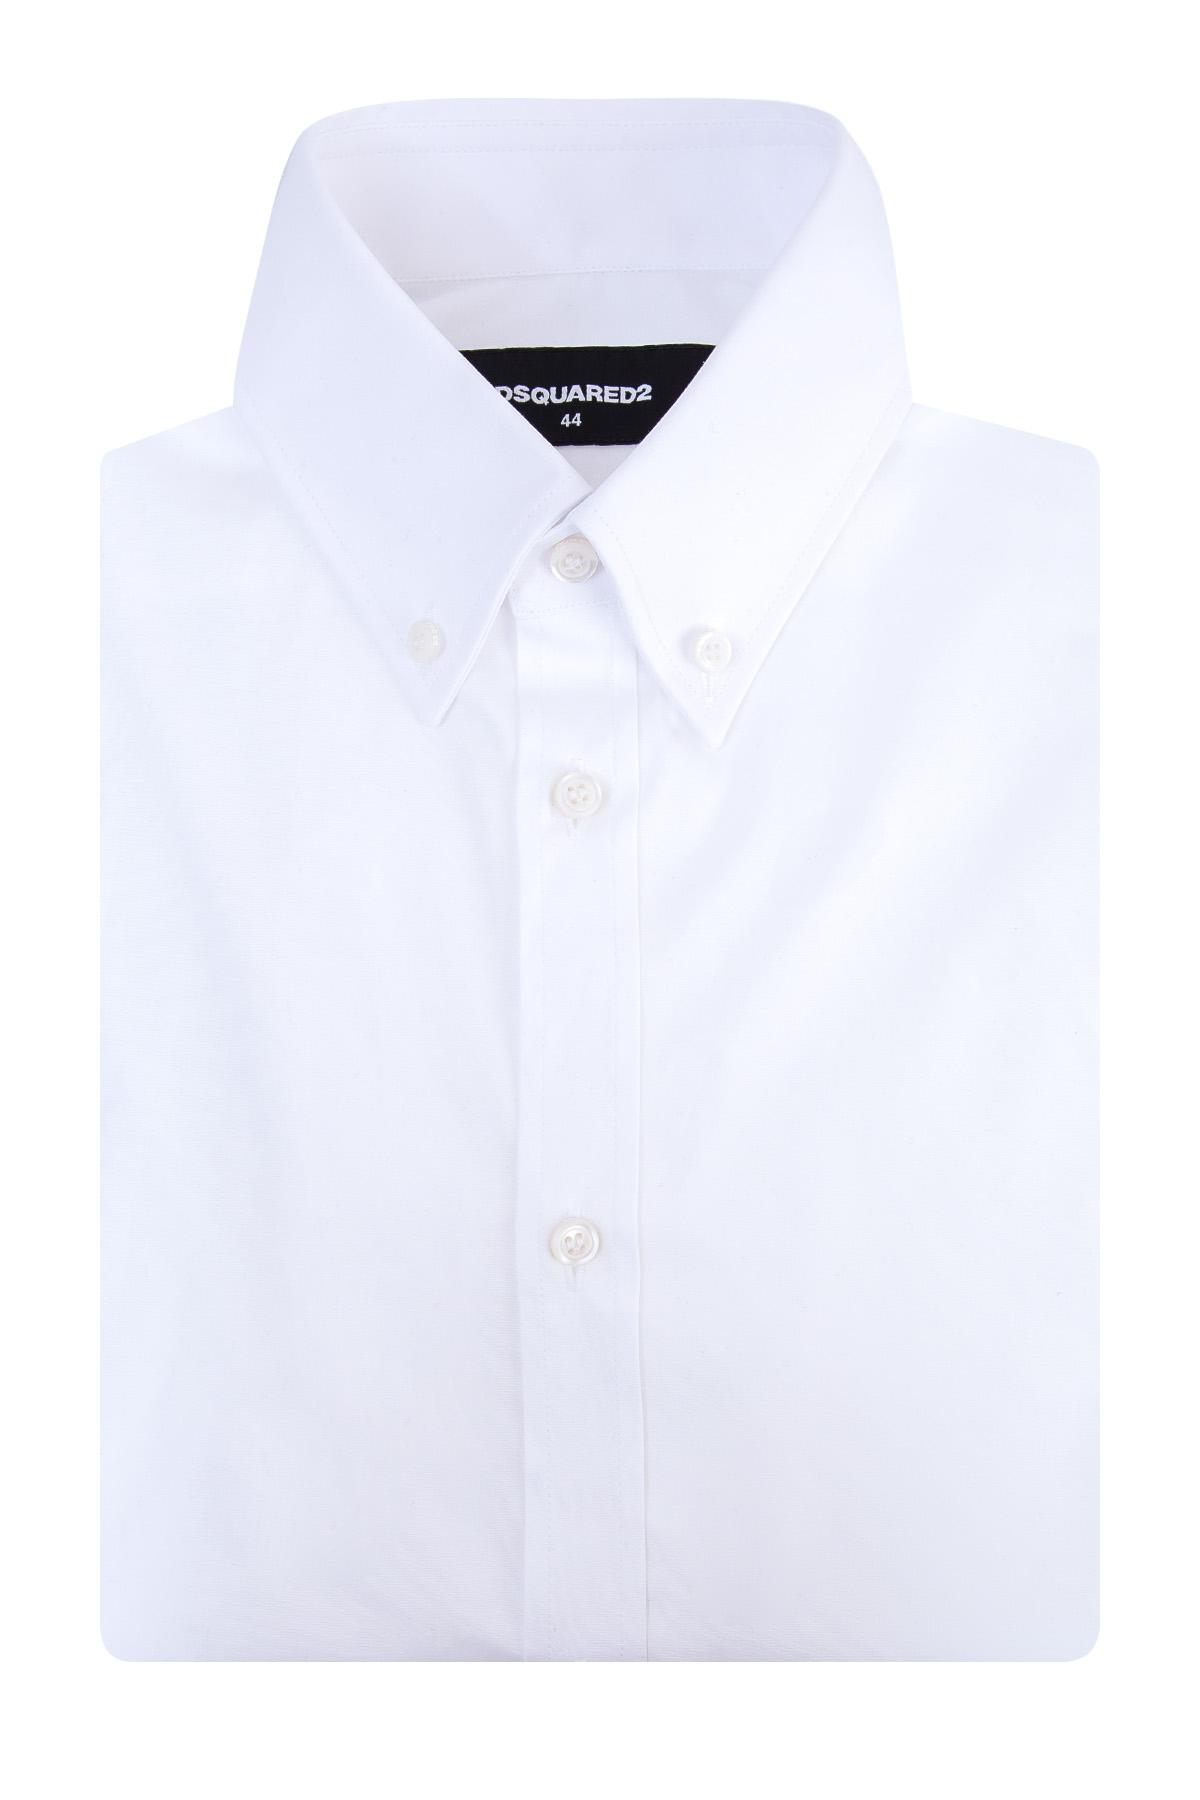 Купить Рубашка, DSQUARED2, Италия, хлопок 97%, эластан 3%